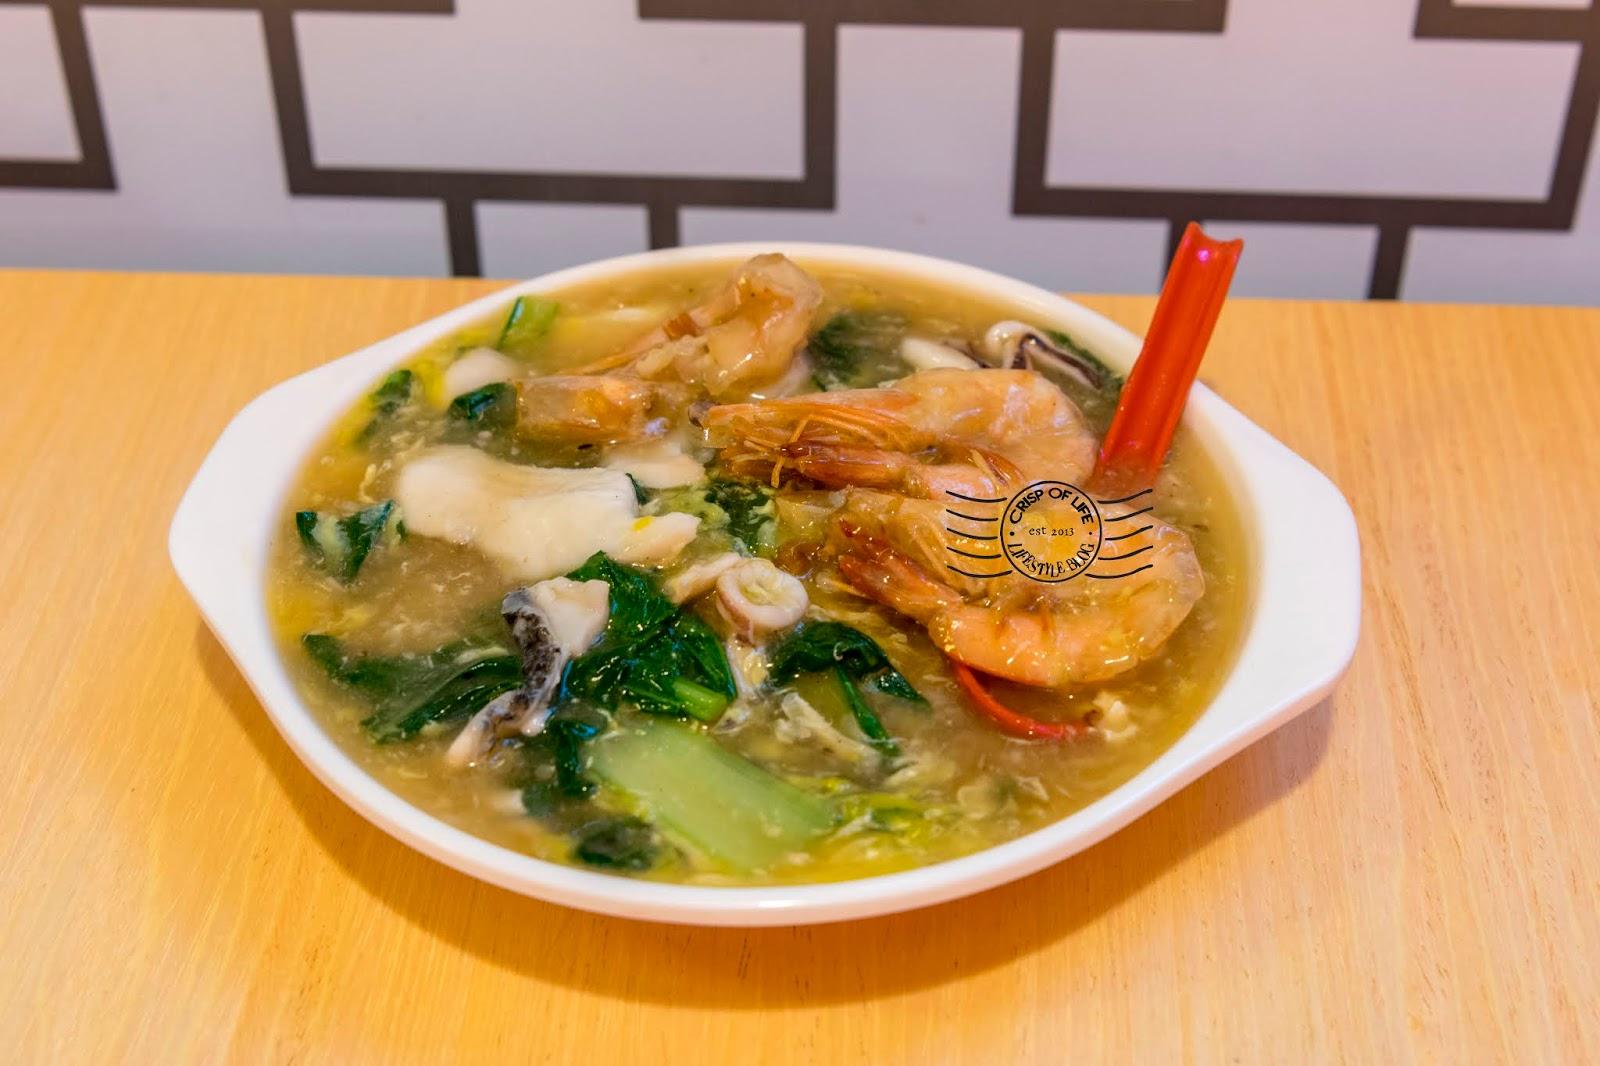 Traditional Chinese Soup @ Lao Huo Tang 老火汤, Gurney Plaza, Penang